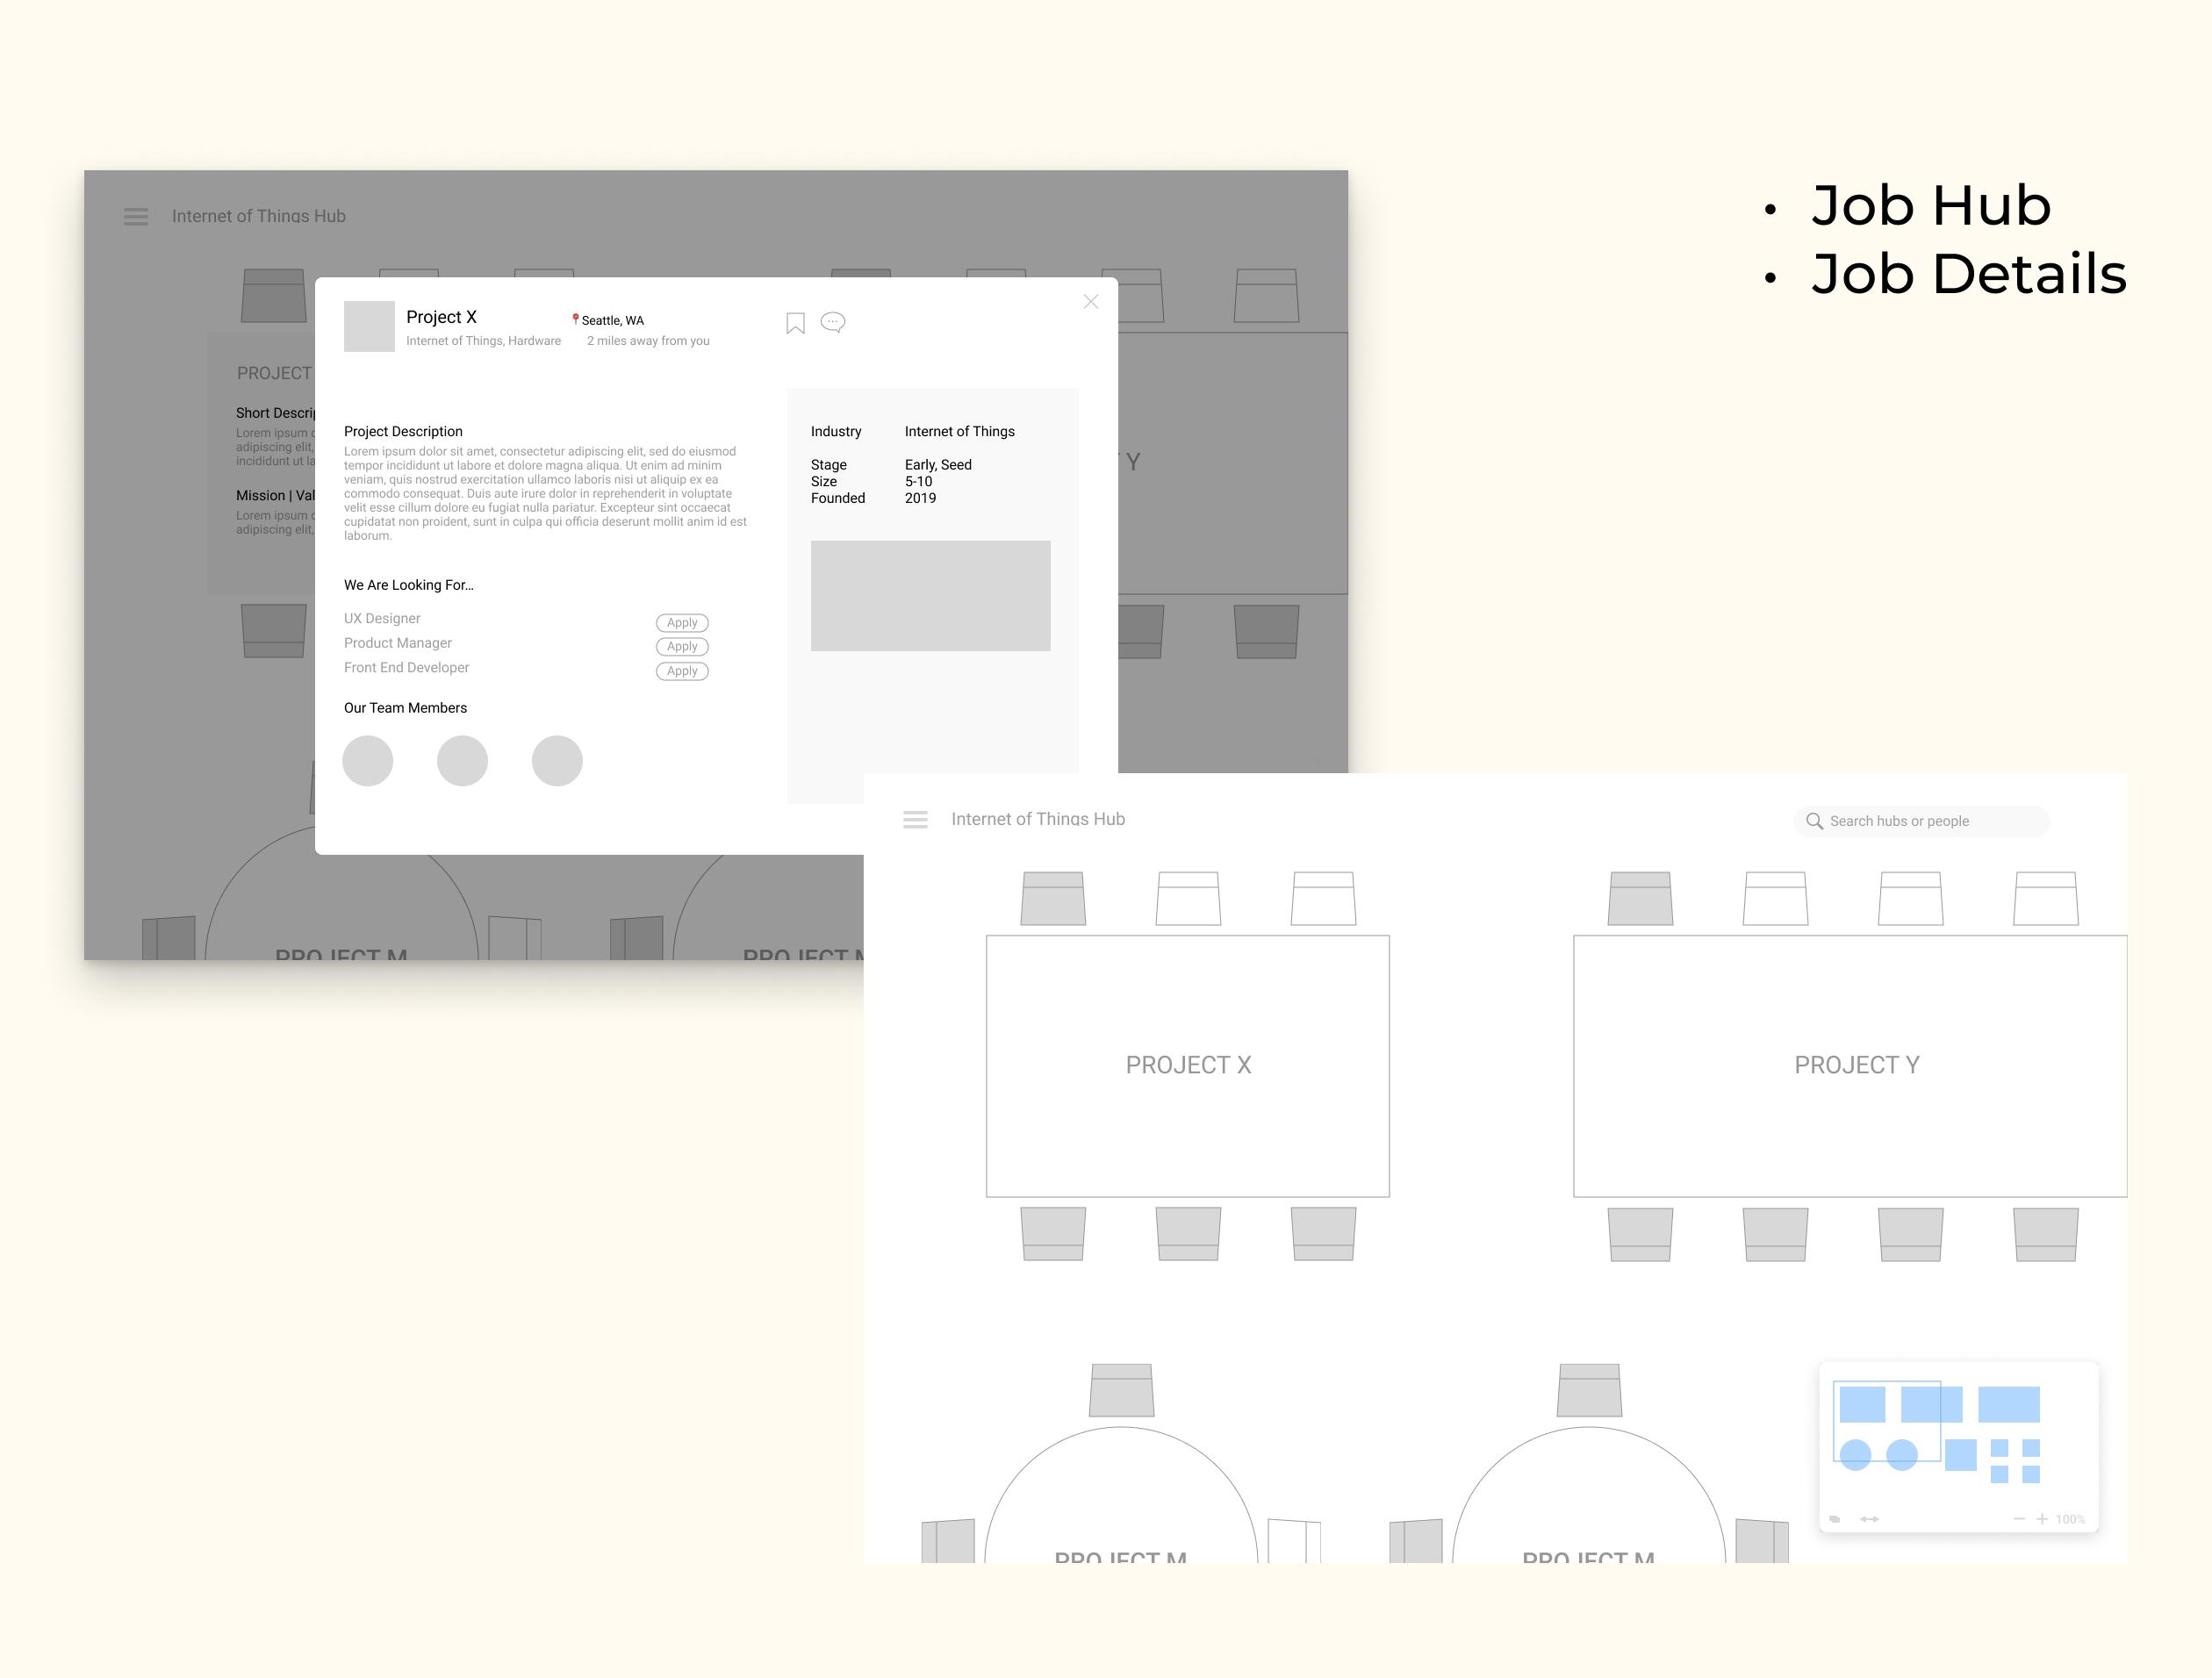 Medium-fidelity mockup of job hub feature and job details interaction.